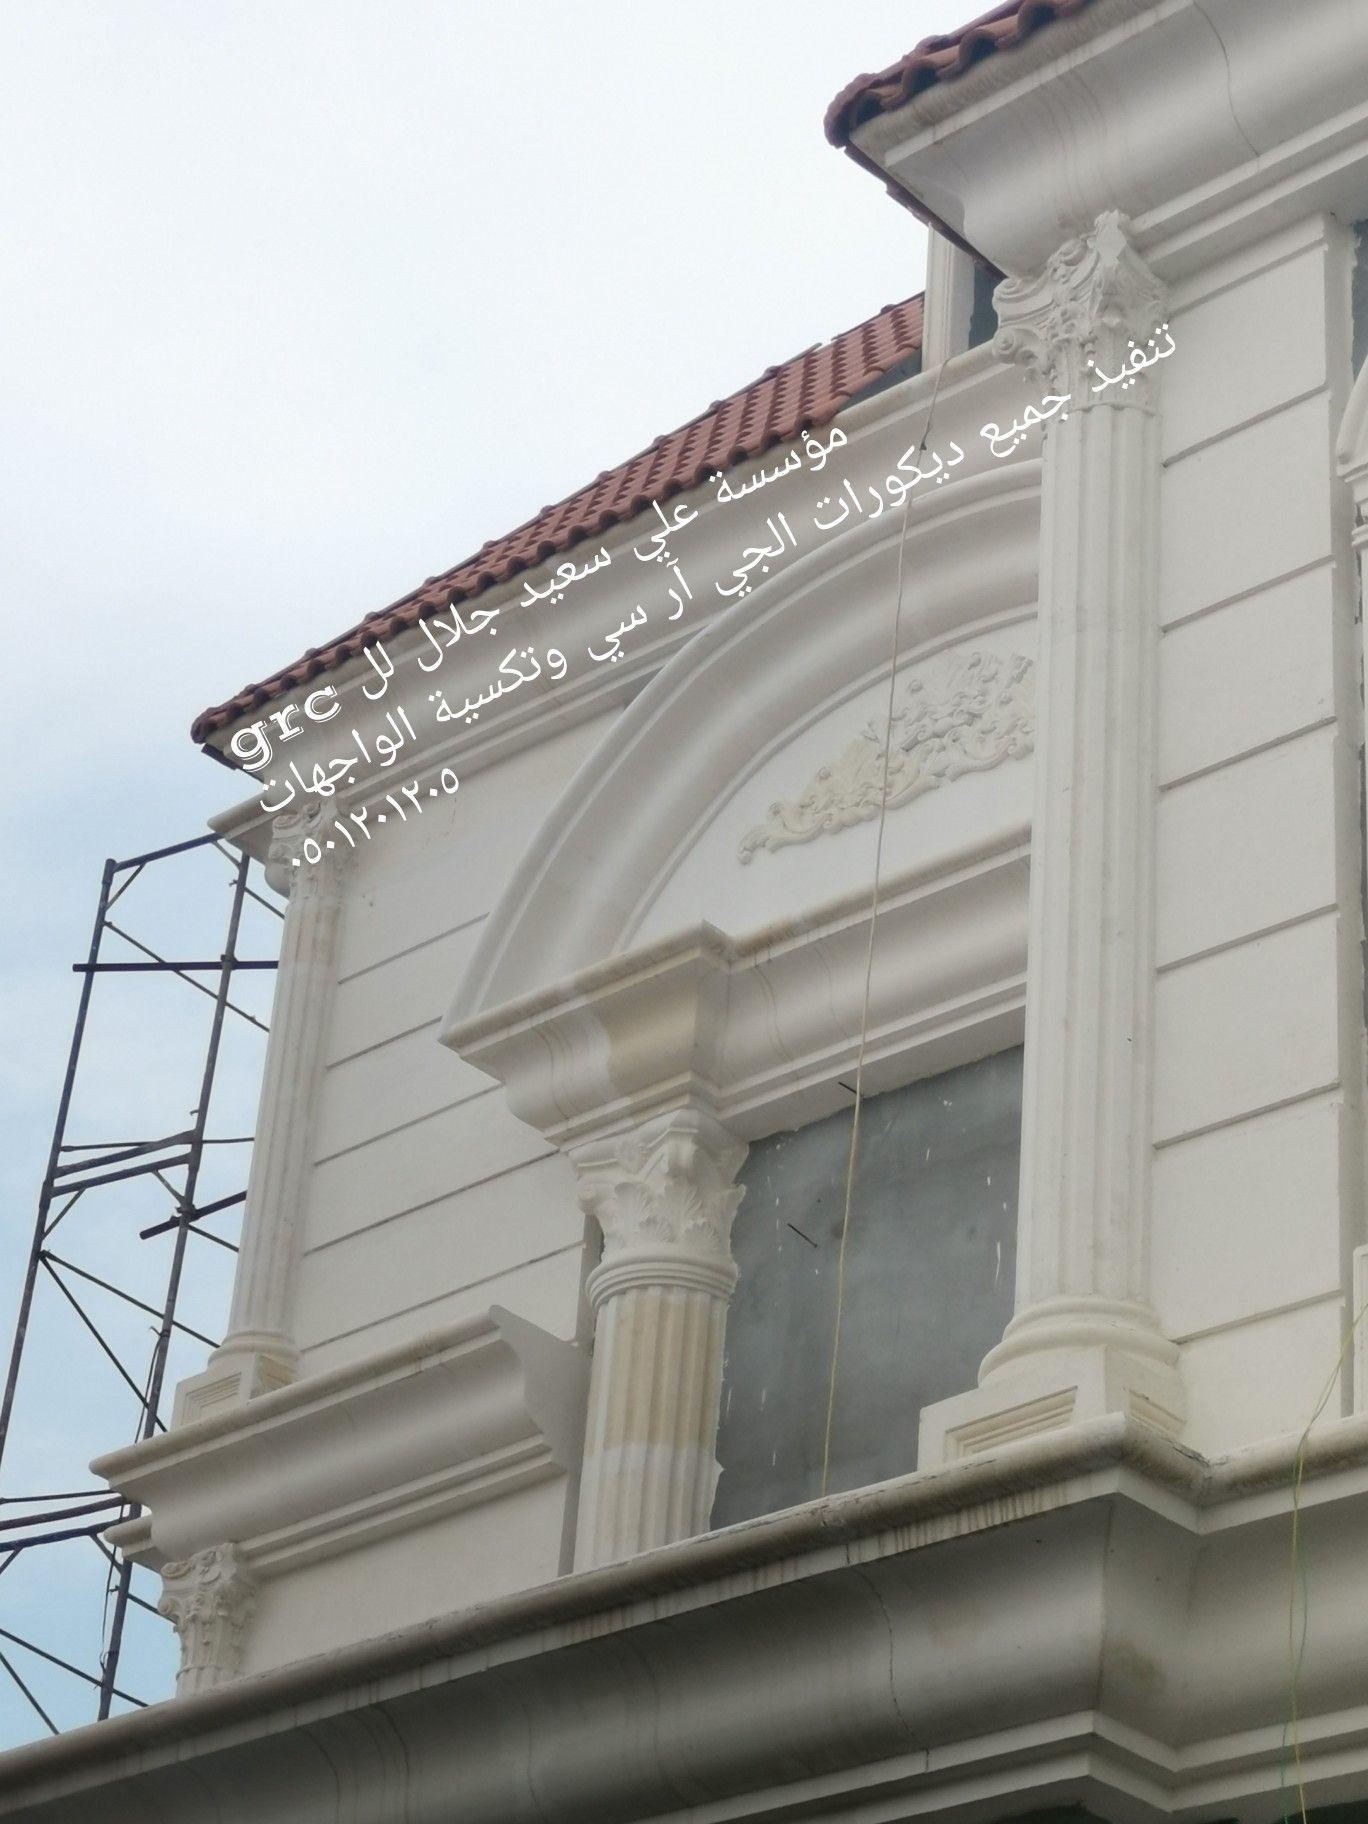 Pin By عبدالرحمن التلاوي On Grc Decor 0501201205 Decor Roman Shade Curtain Home Decor